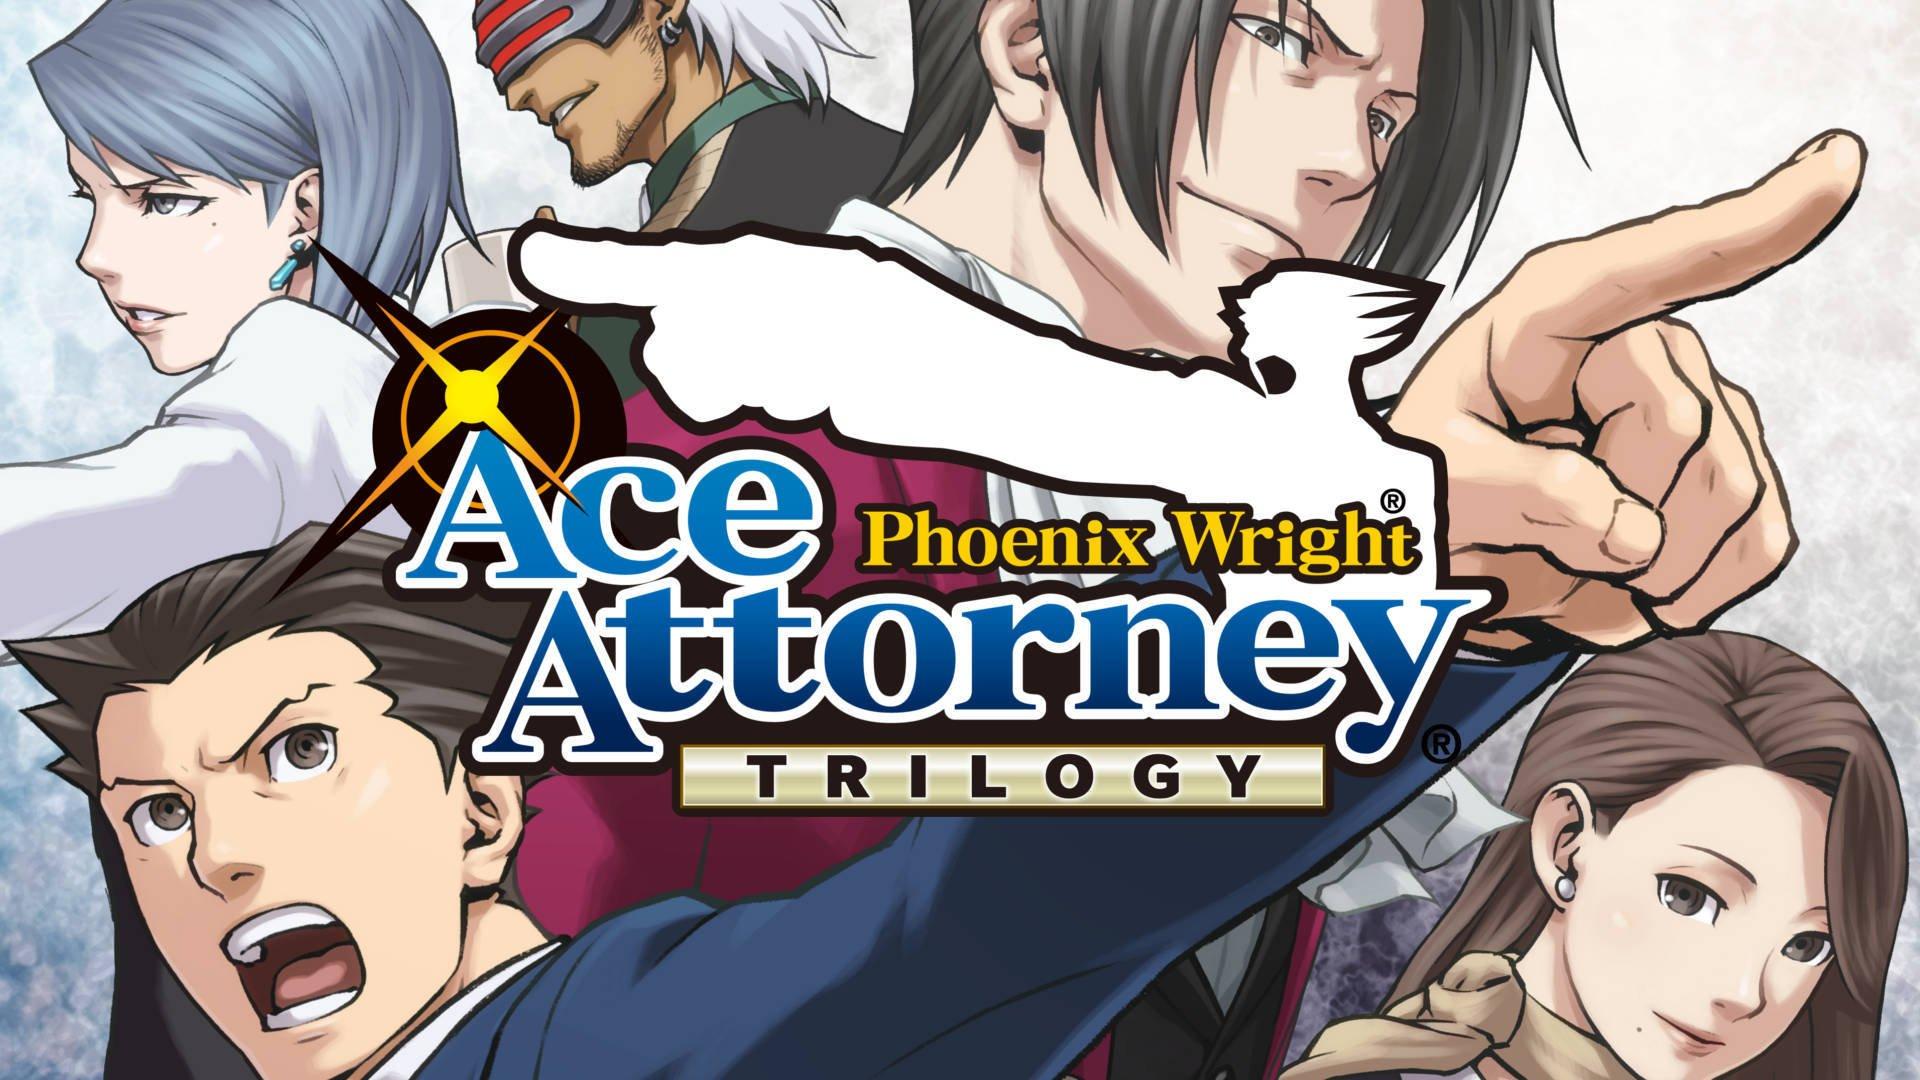 Phoenix Wright: Ace Attorney Trilogy 37